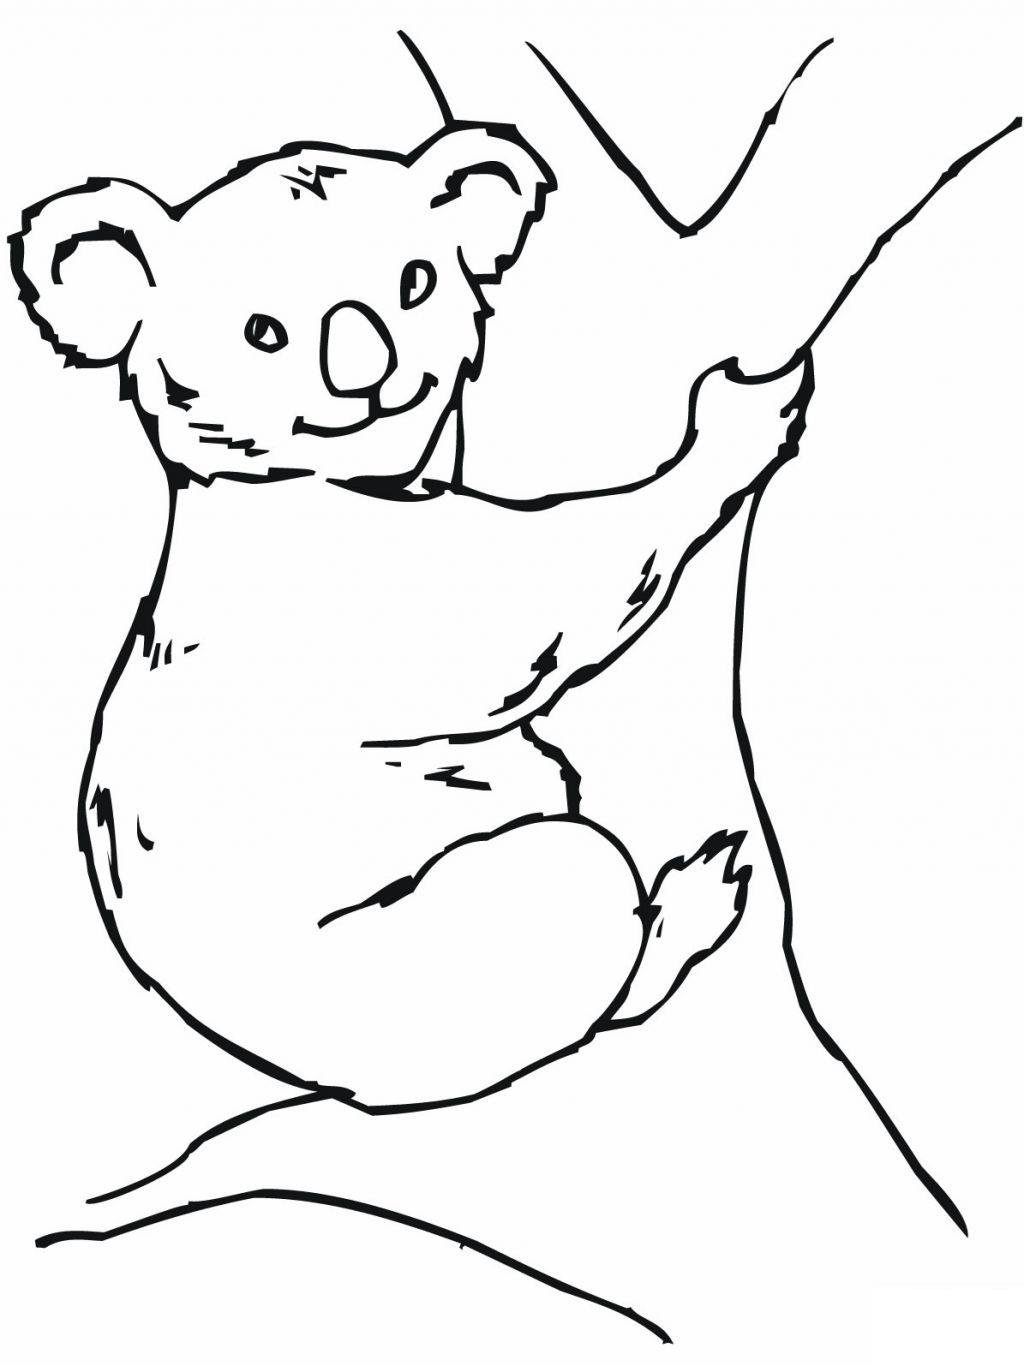 Line Drawing Koala : Koala coloring pages clipart panda free images